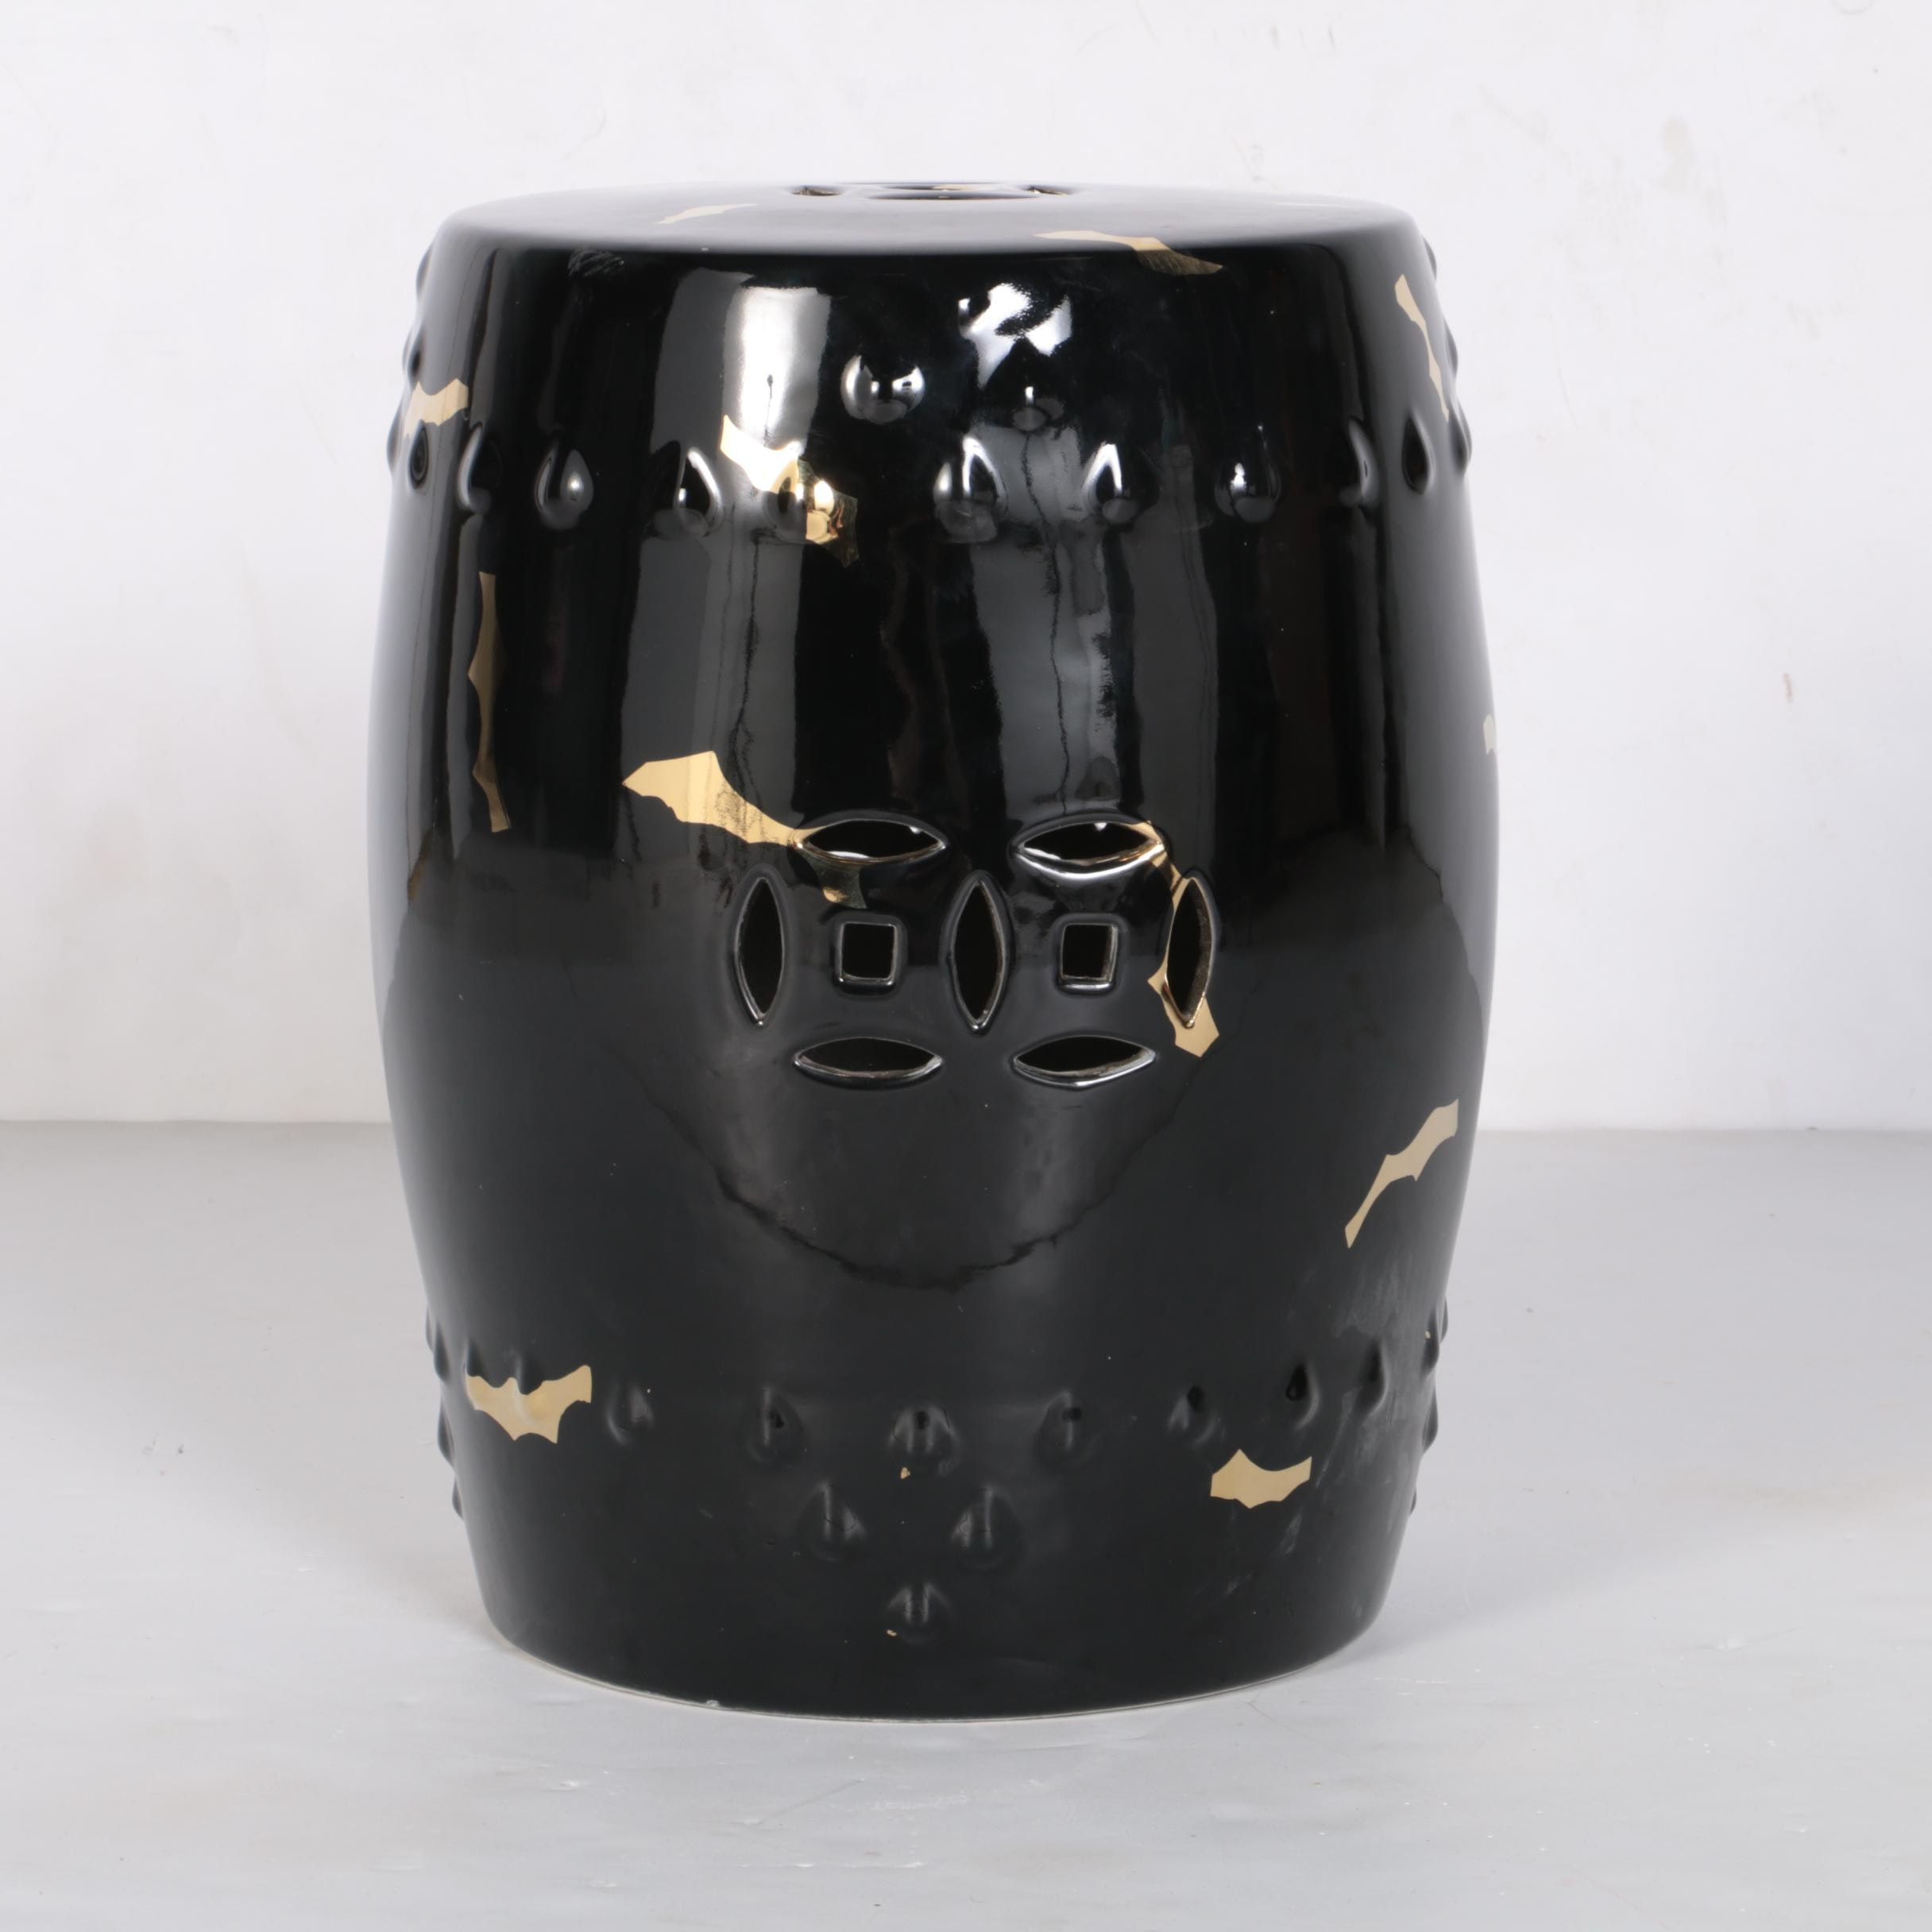 Chinese Black Painted Ceramic Garden Stool ...